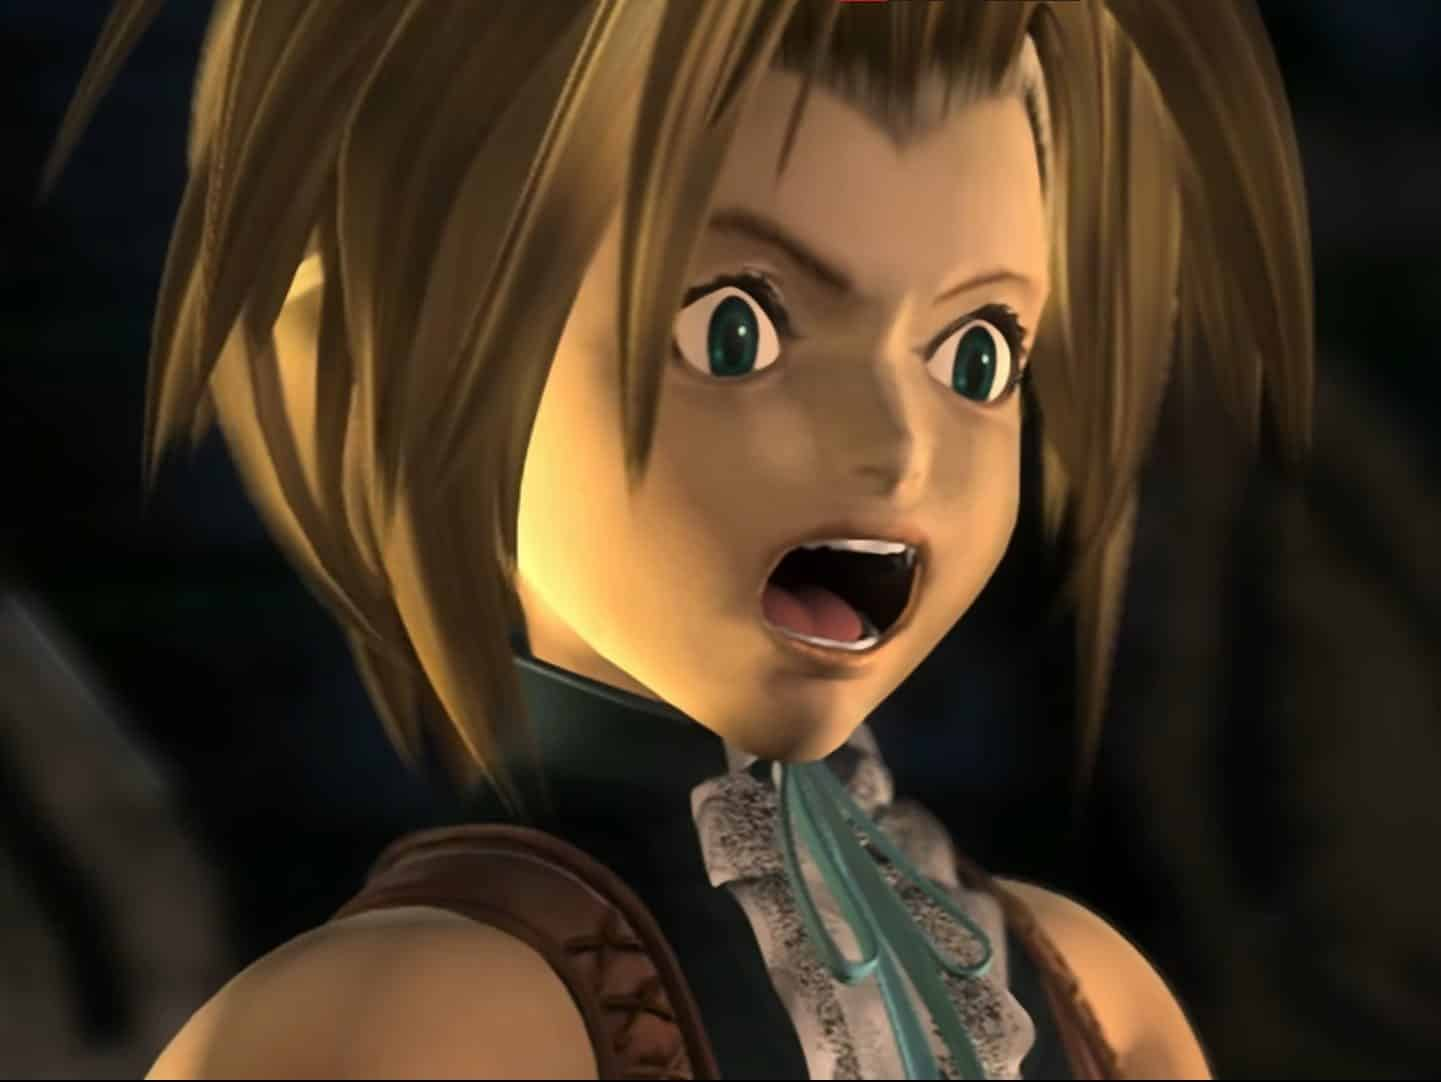 Un personnage de Final Fantasy